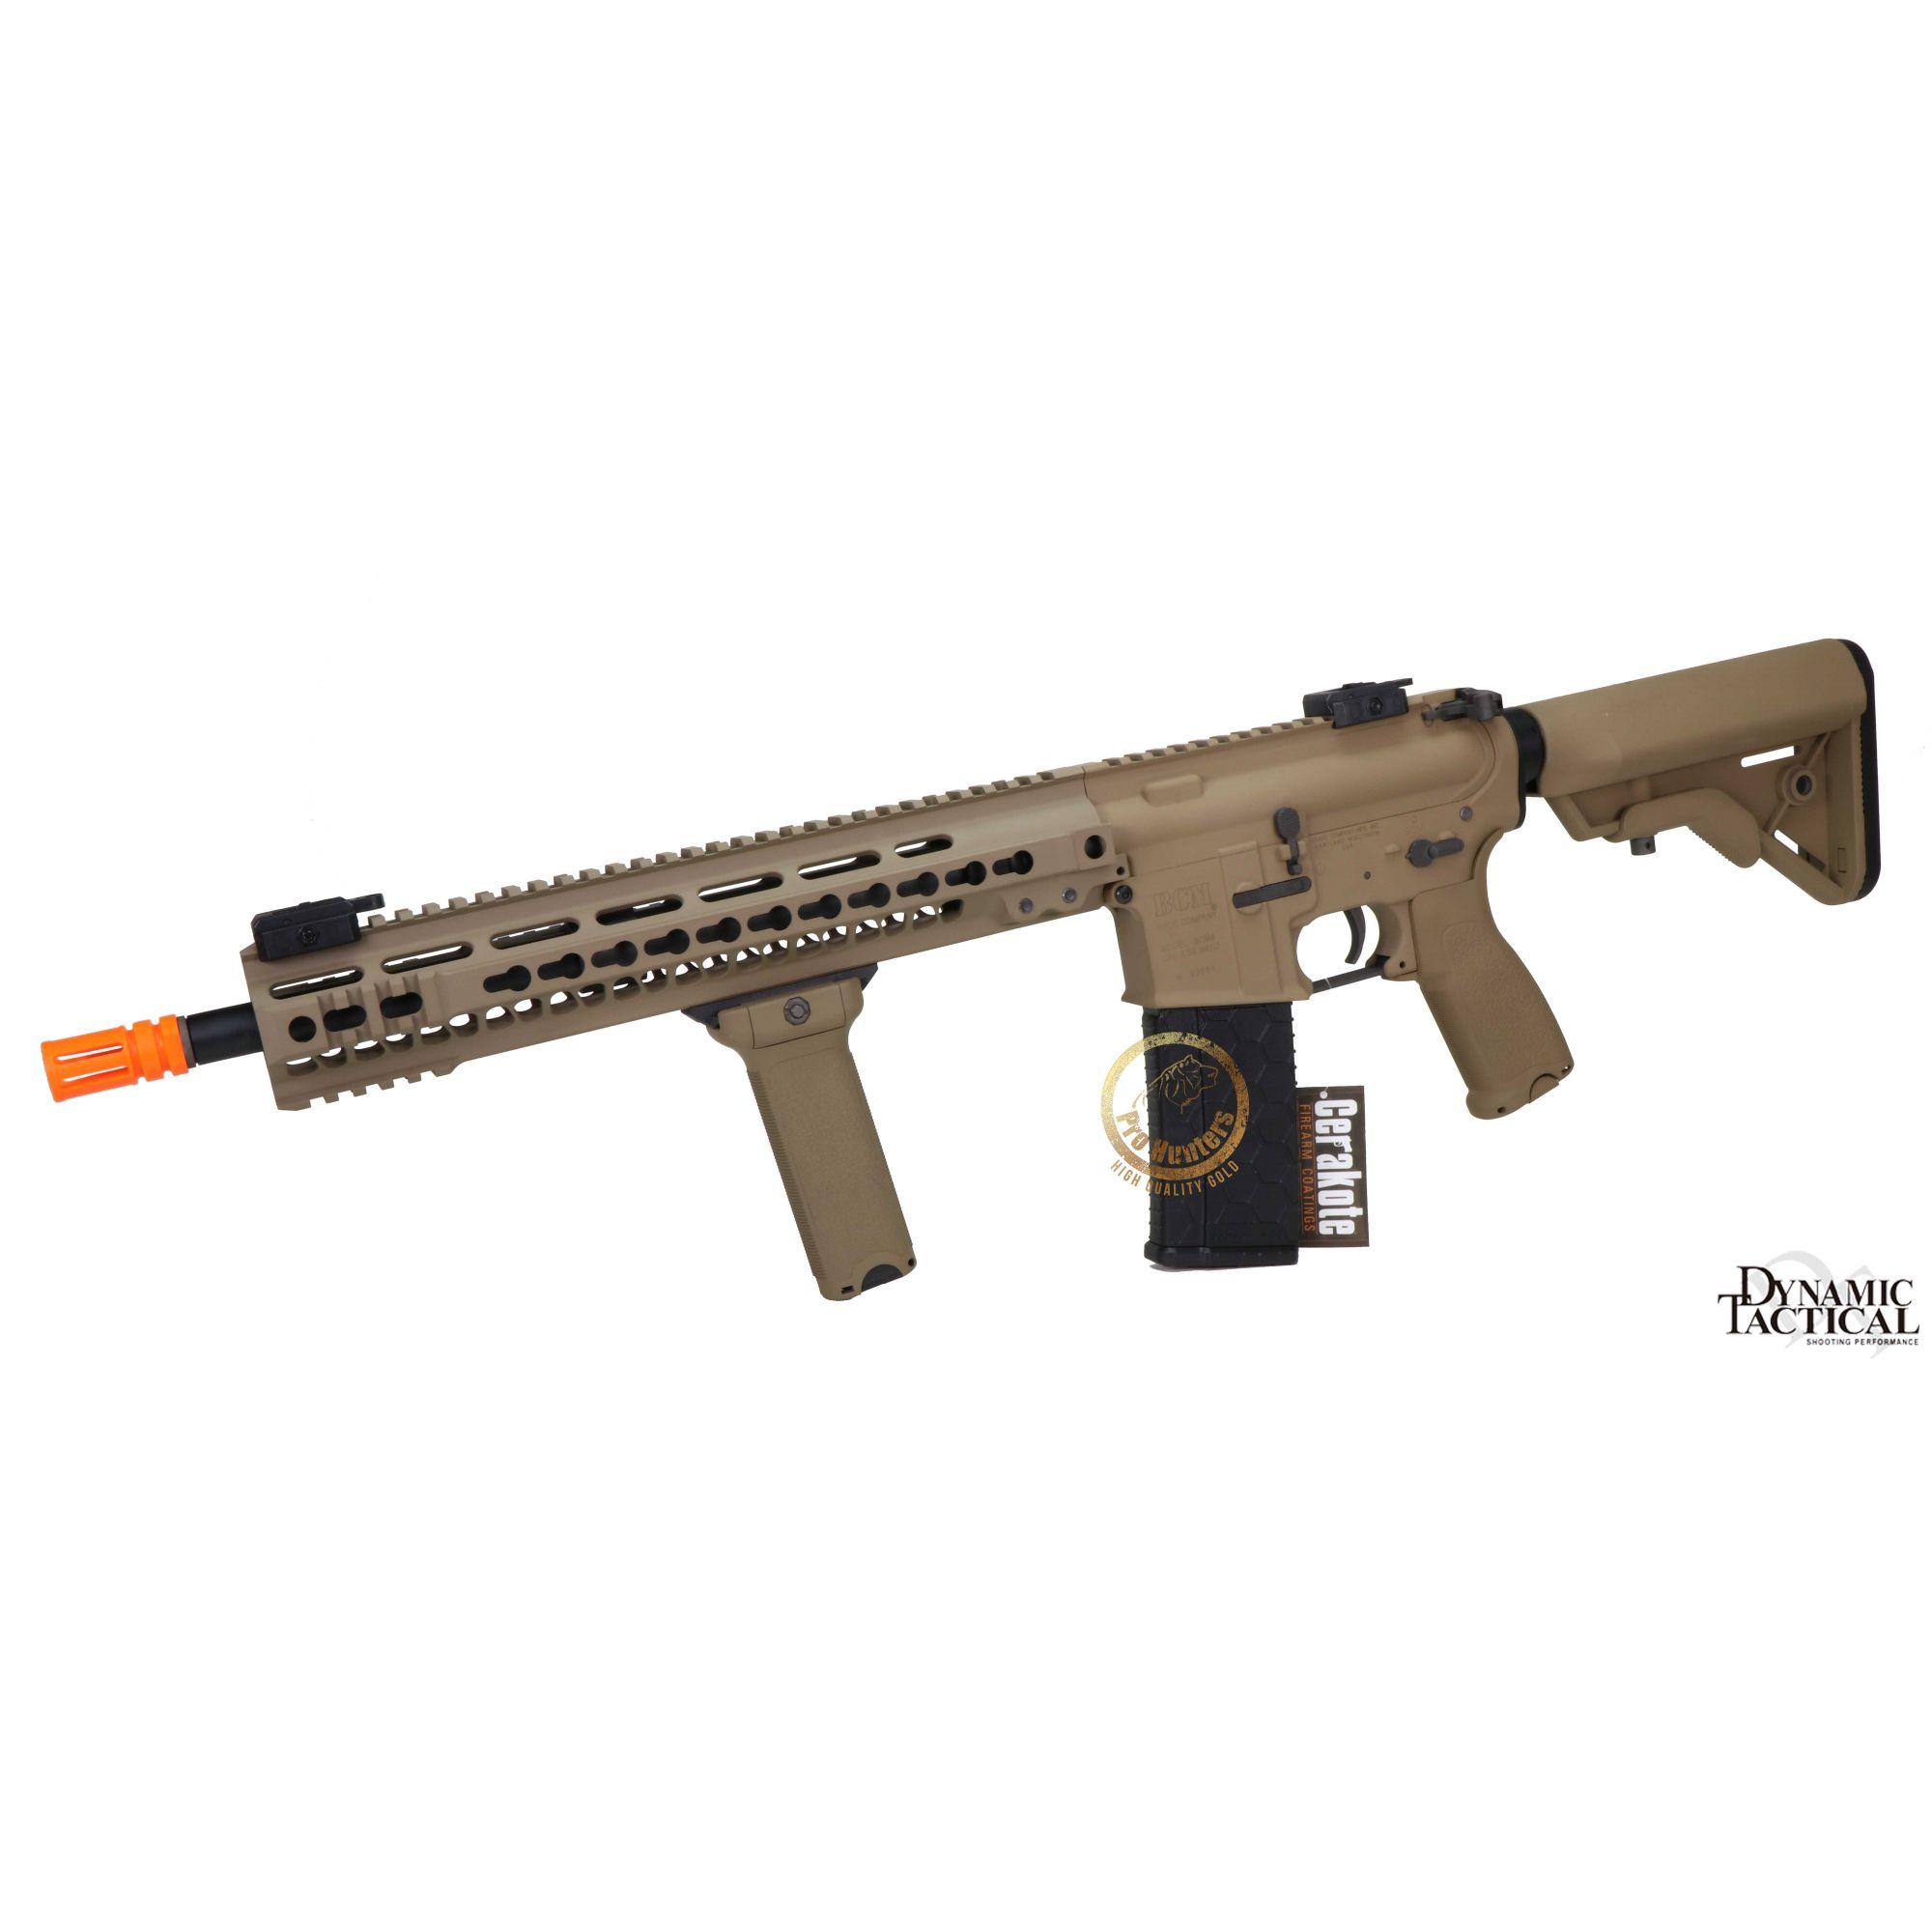 Rifle Airsoft Dytac MK4 SMR 14.5 Polegadas - Magpul Dark Earth